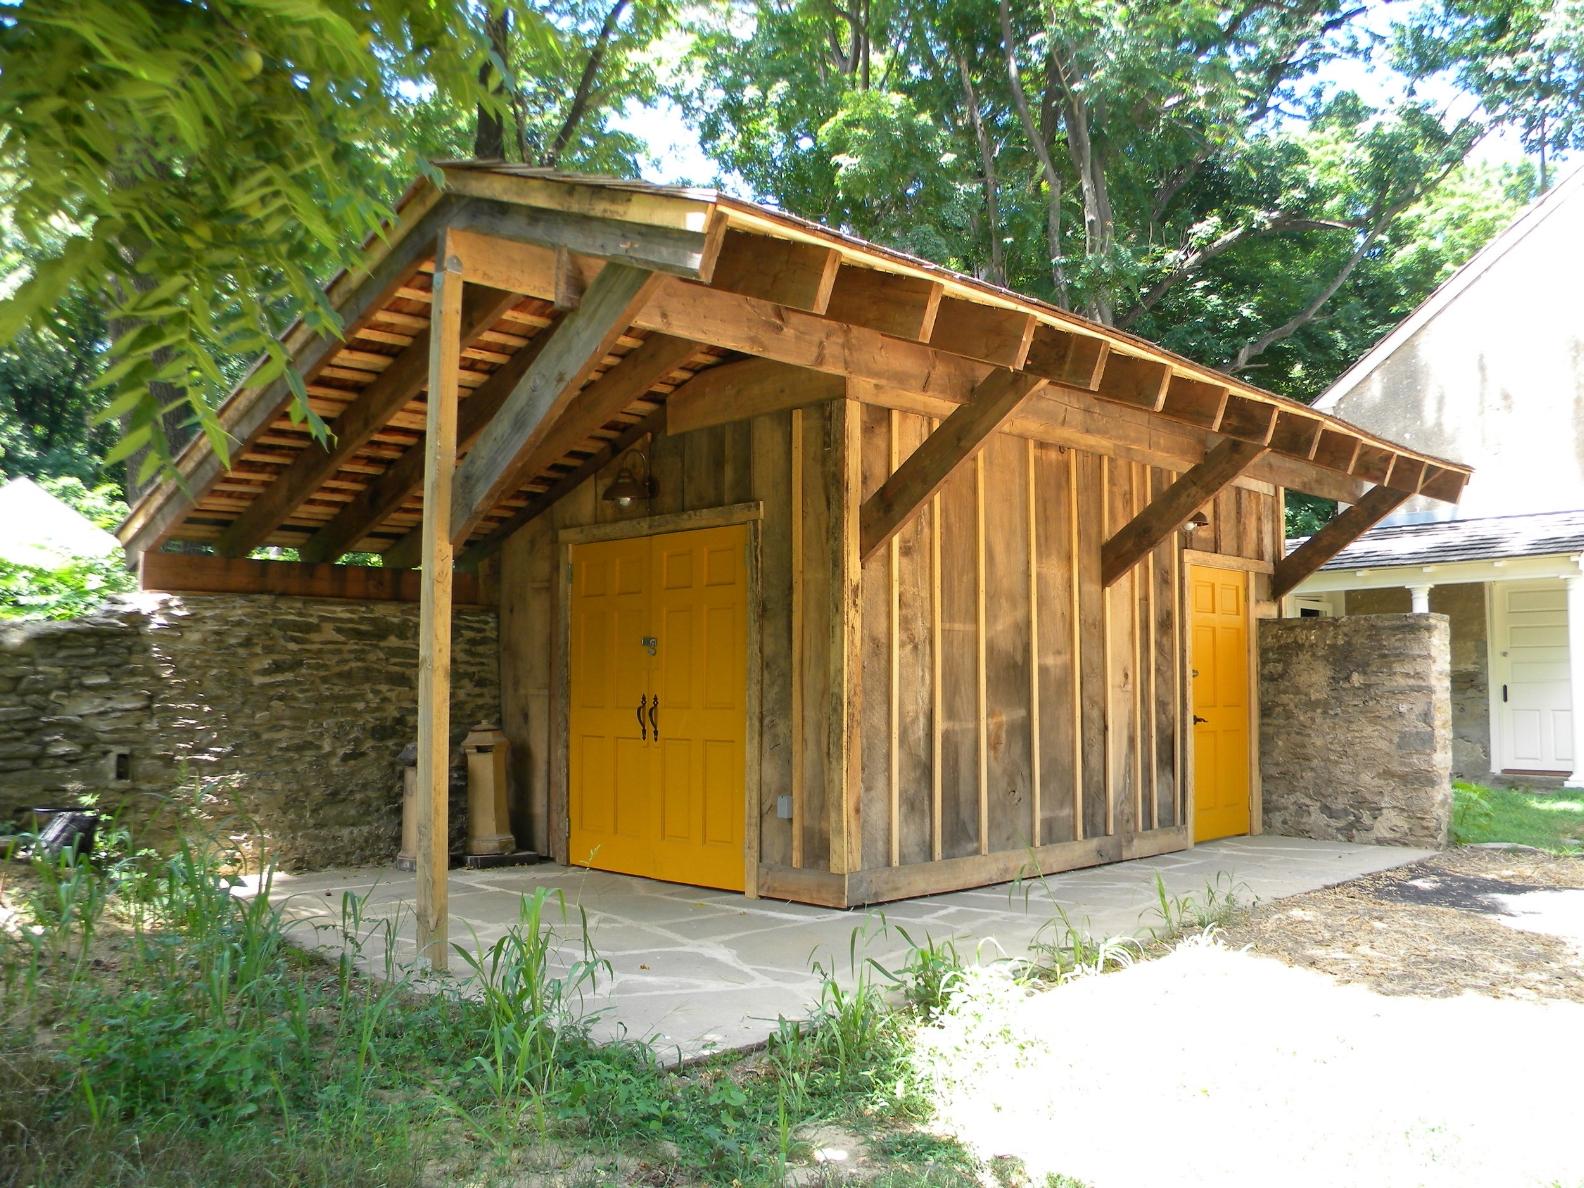 Meetinghouse Reclaimed Wood Outbuilding.jpg